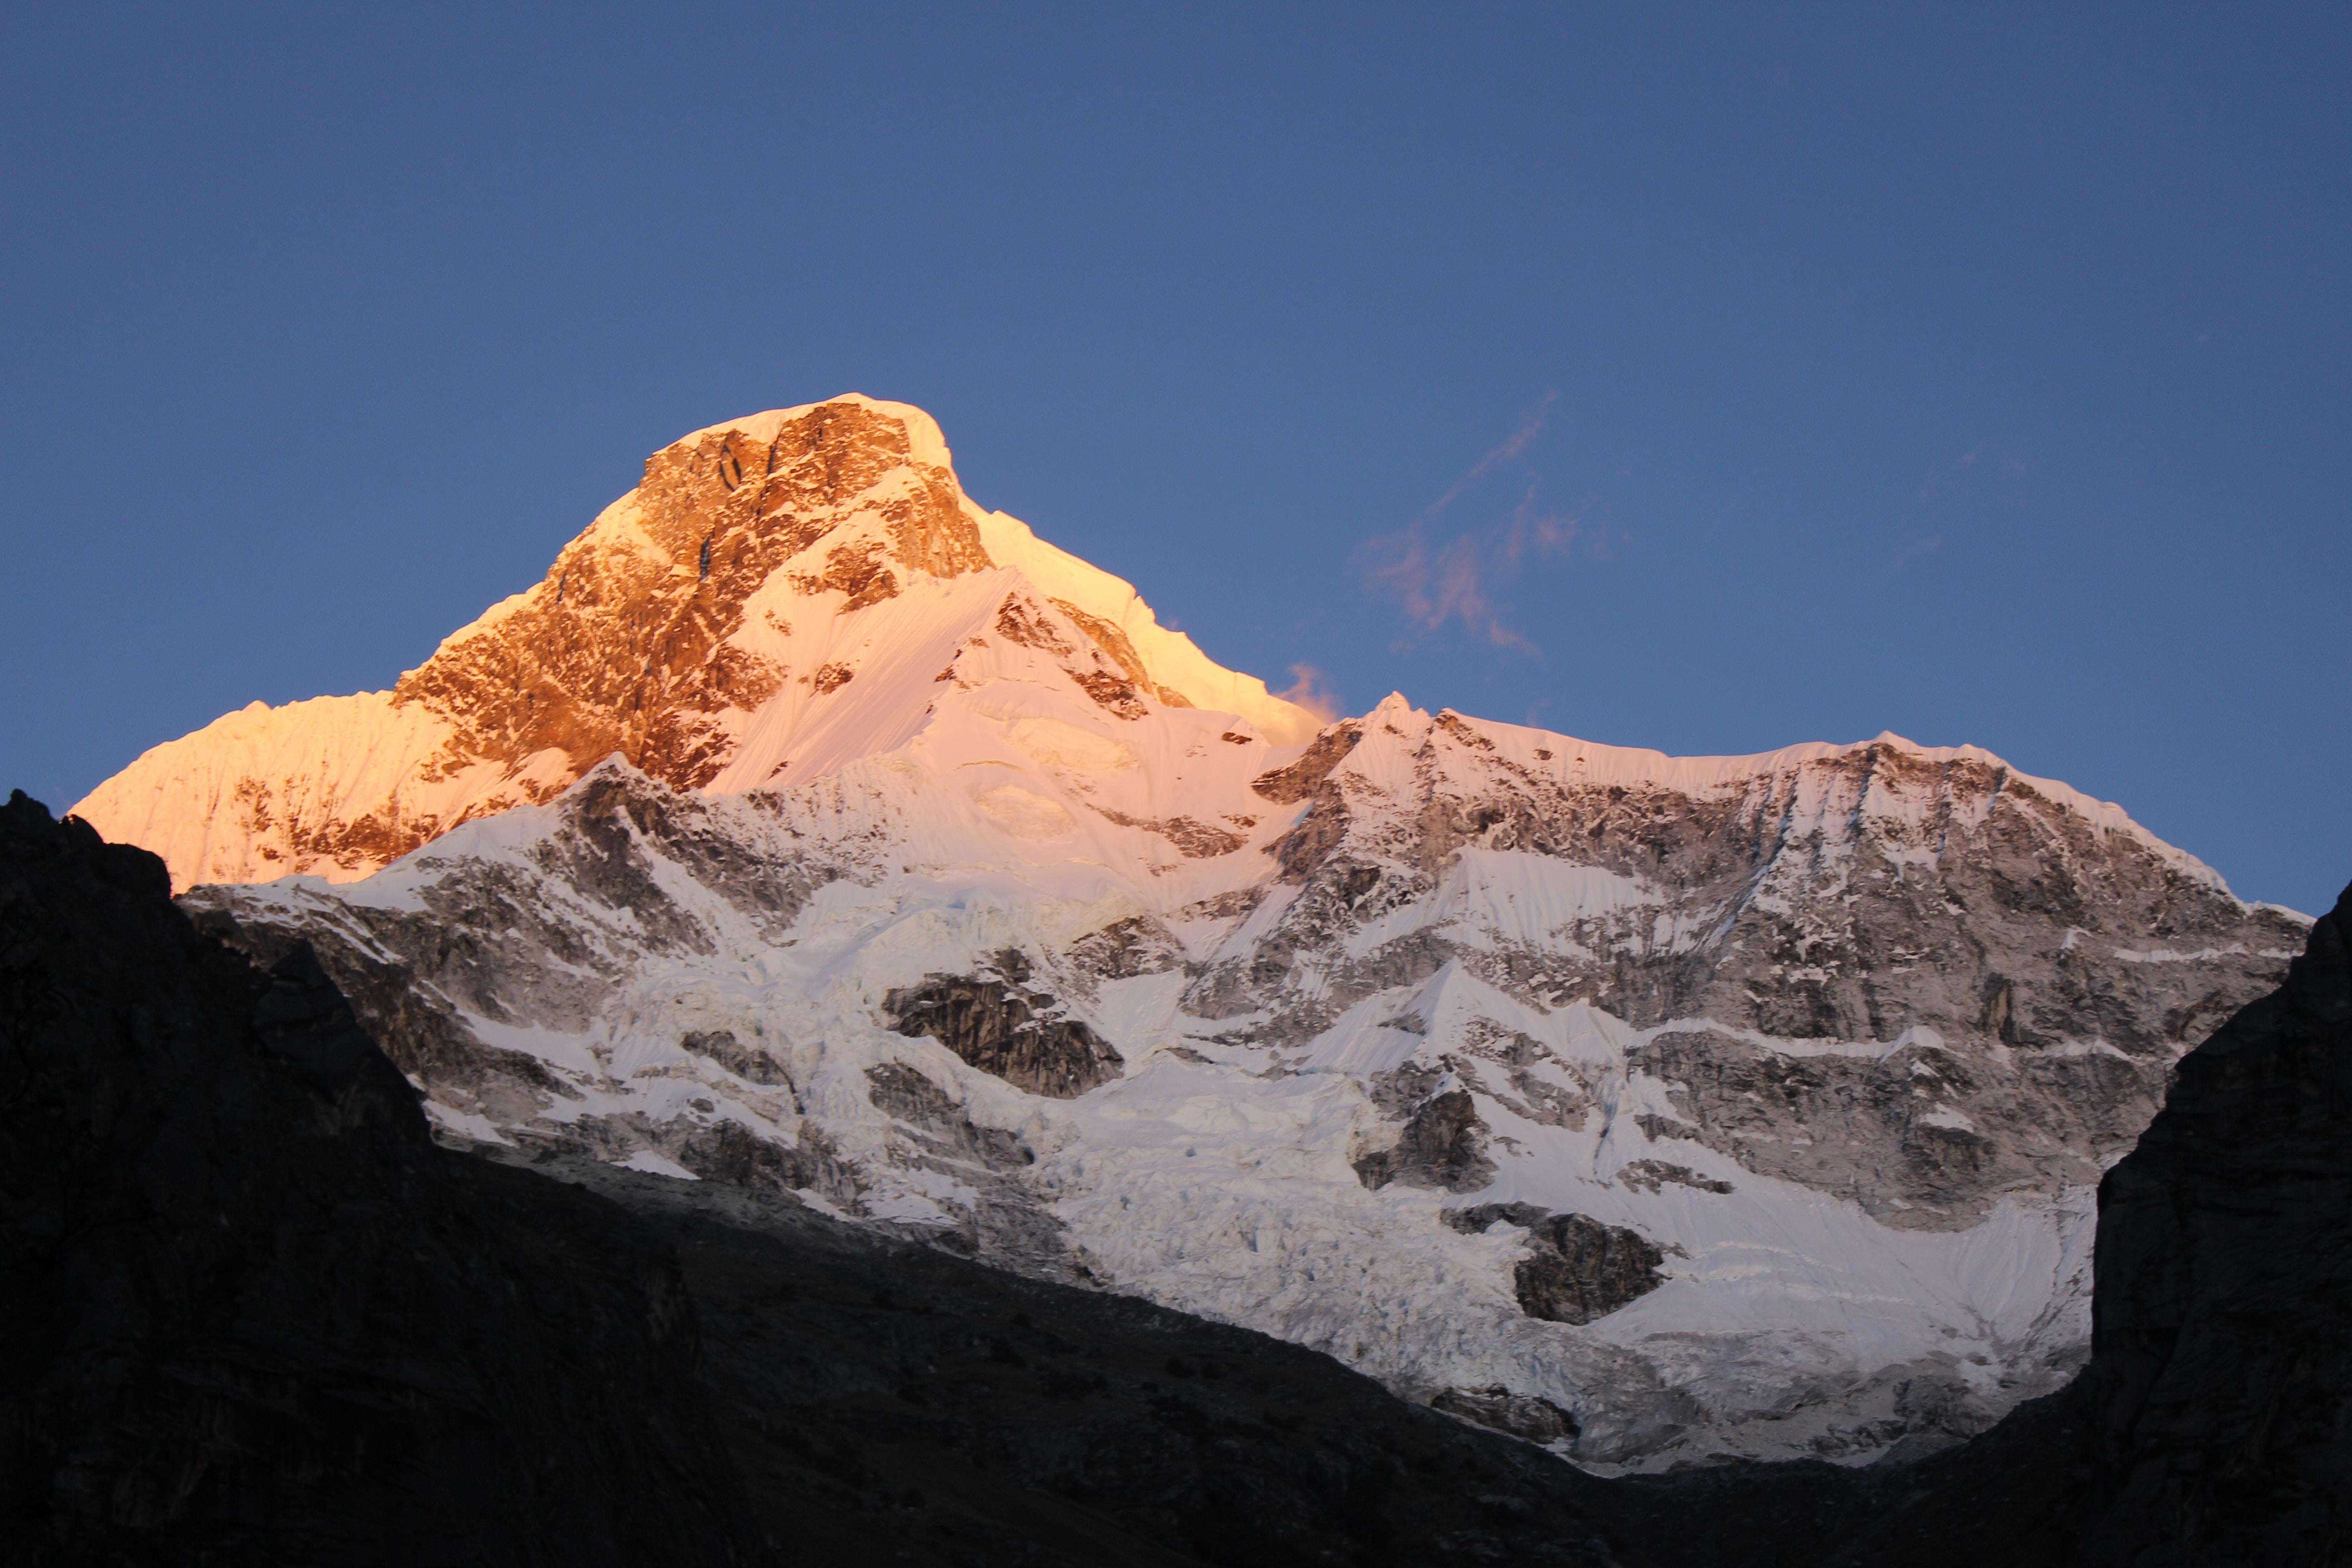 The golden sunlight highlights a snowy mountain peak against a blue sky